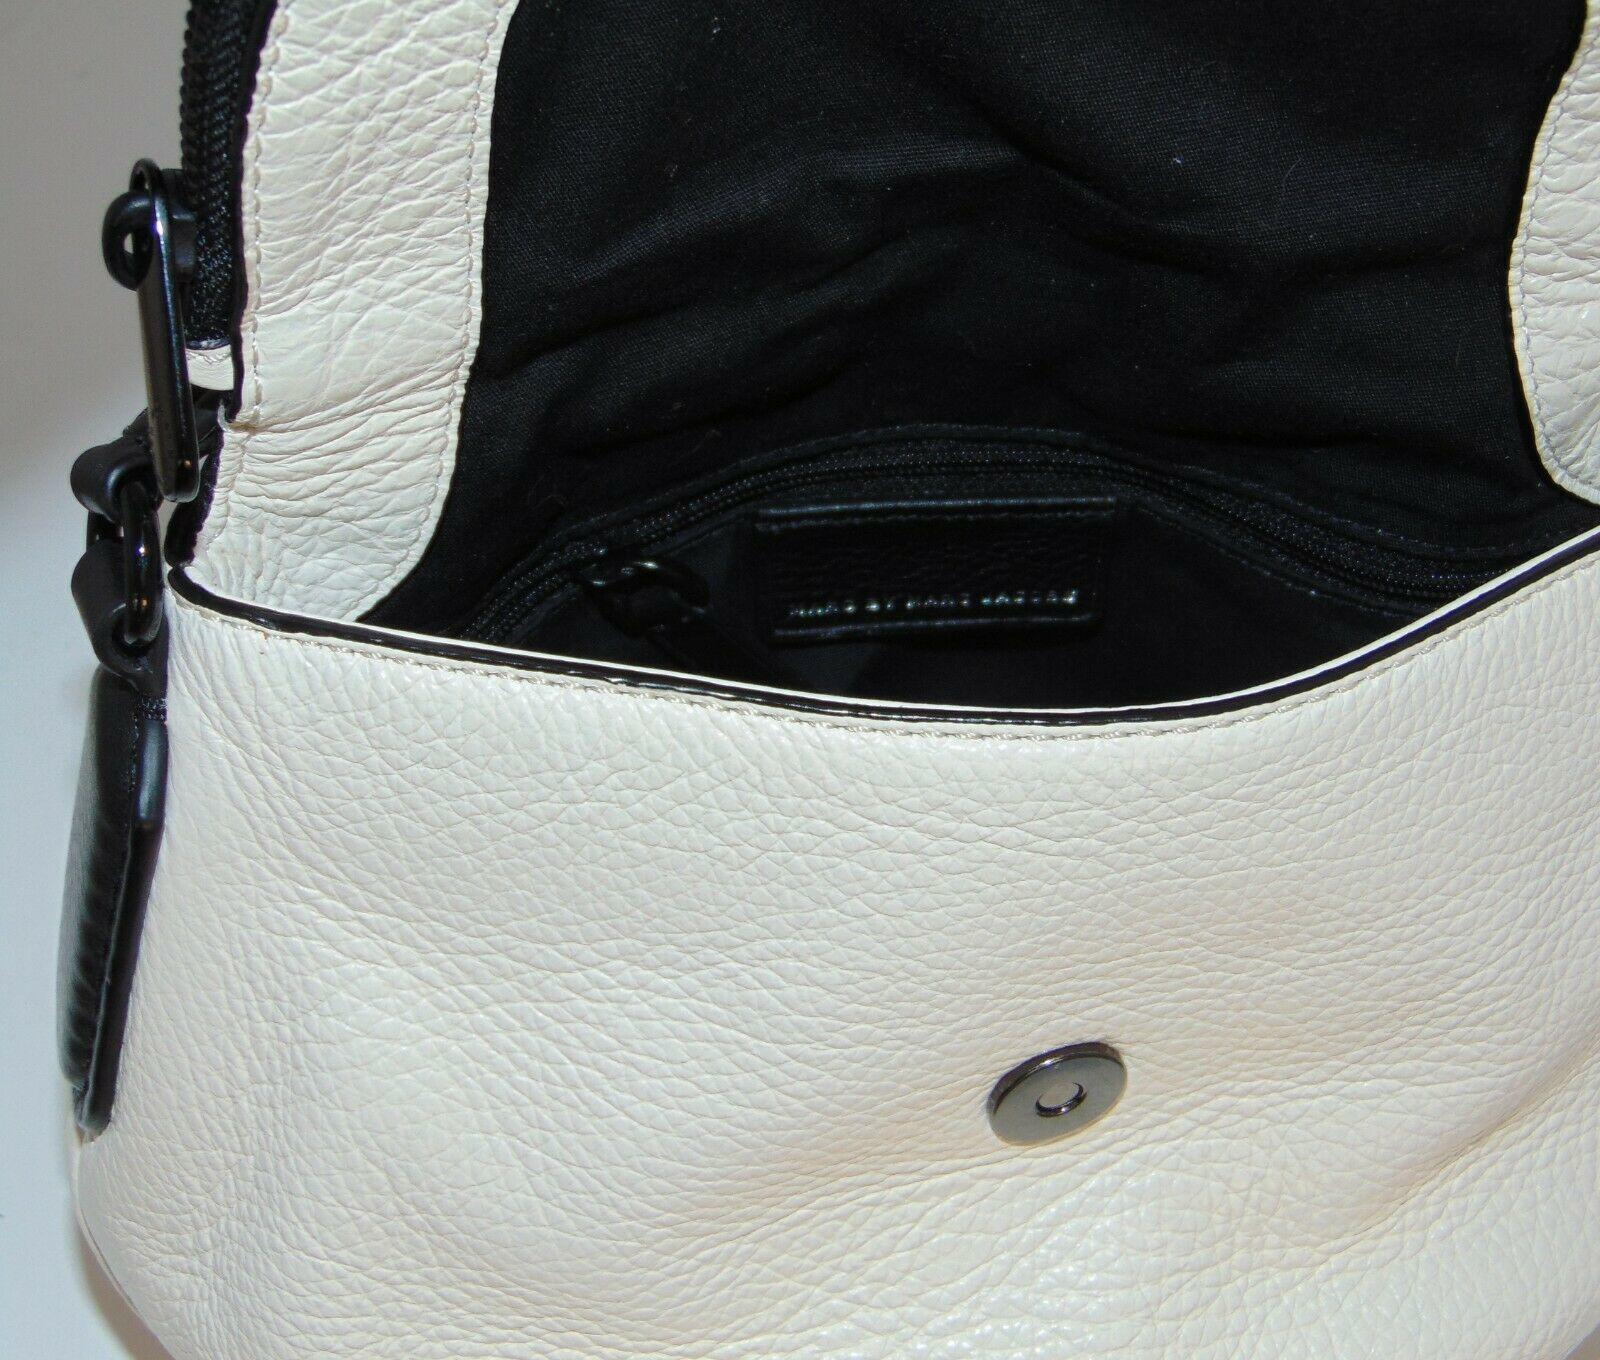 Marc by MARC JACOBS New Q Perforated Mini Natasha Bag  Black/Milk image 6